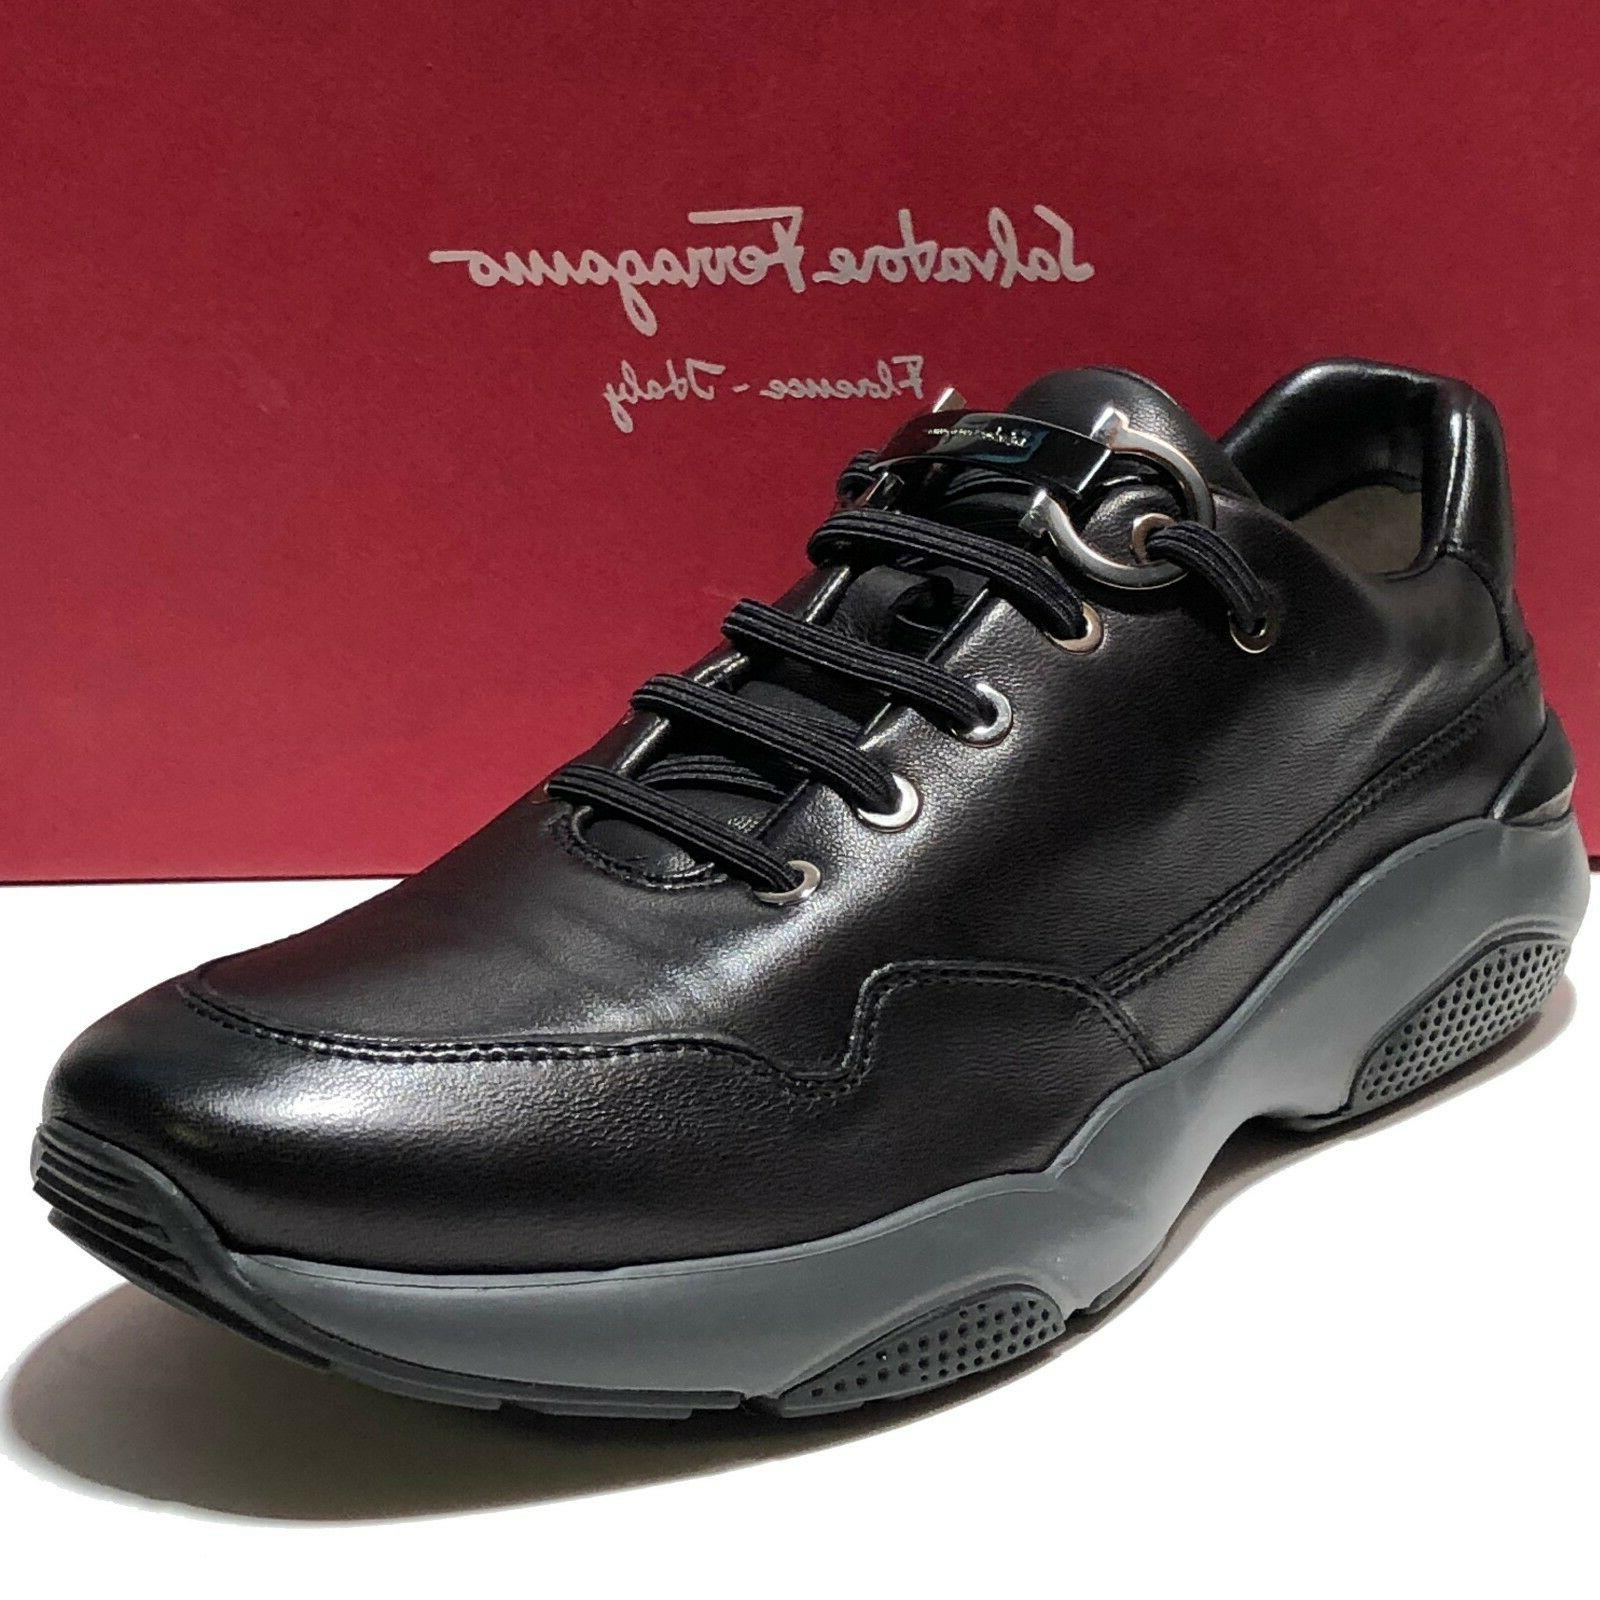 Ferragamo Gancini Sneakers 10.5 EE 43.5 Men's Nappa Leather